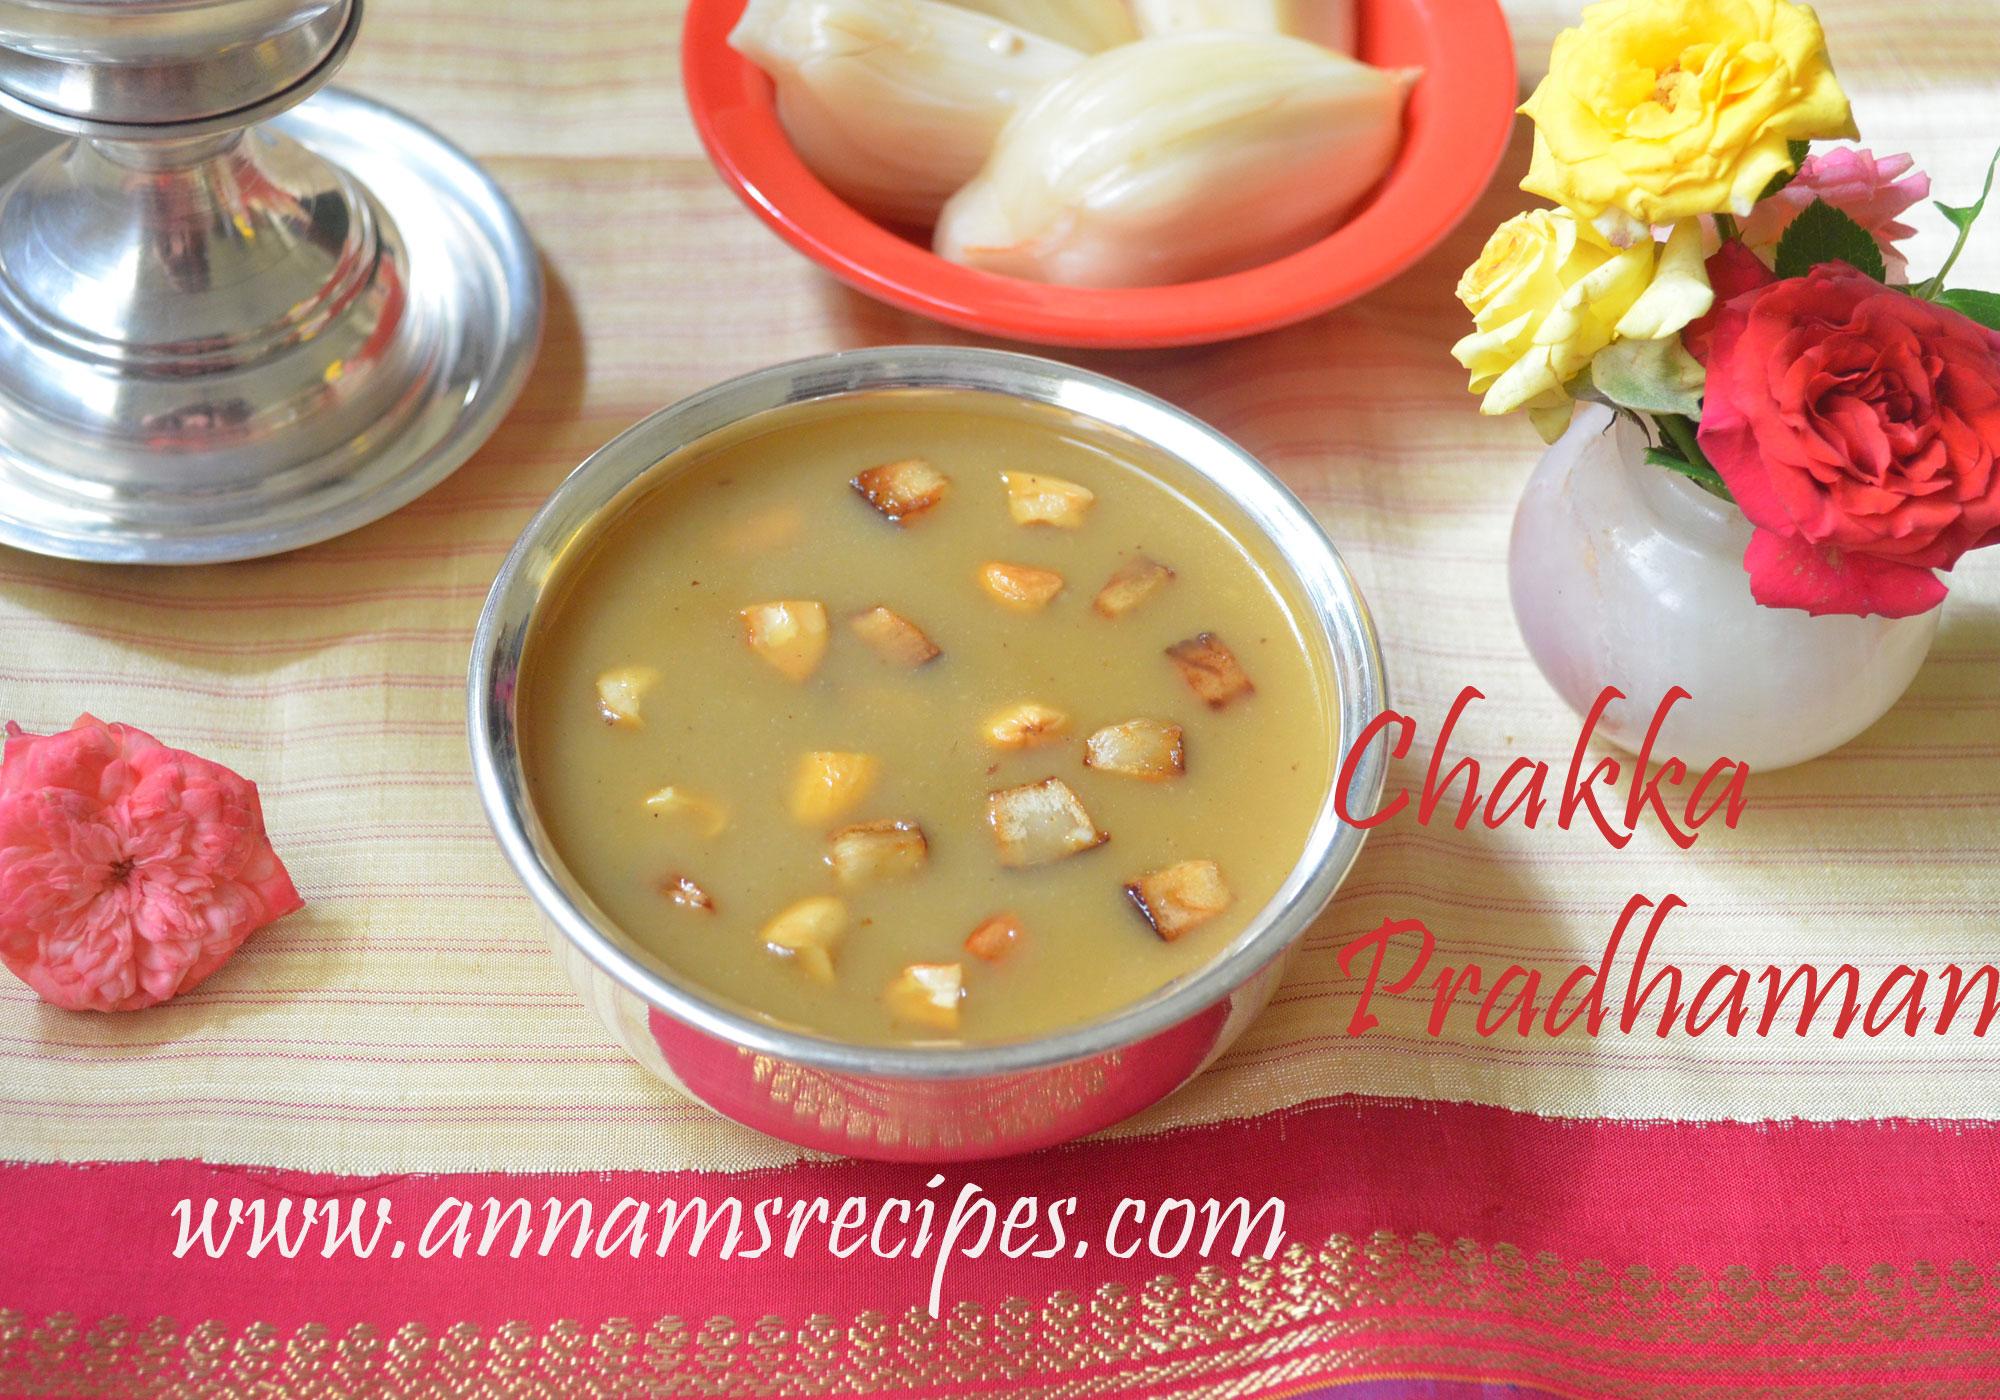 Chakka Pradhaman or Jackfruit Payasam